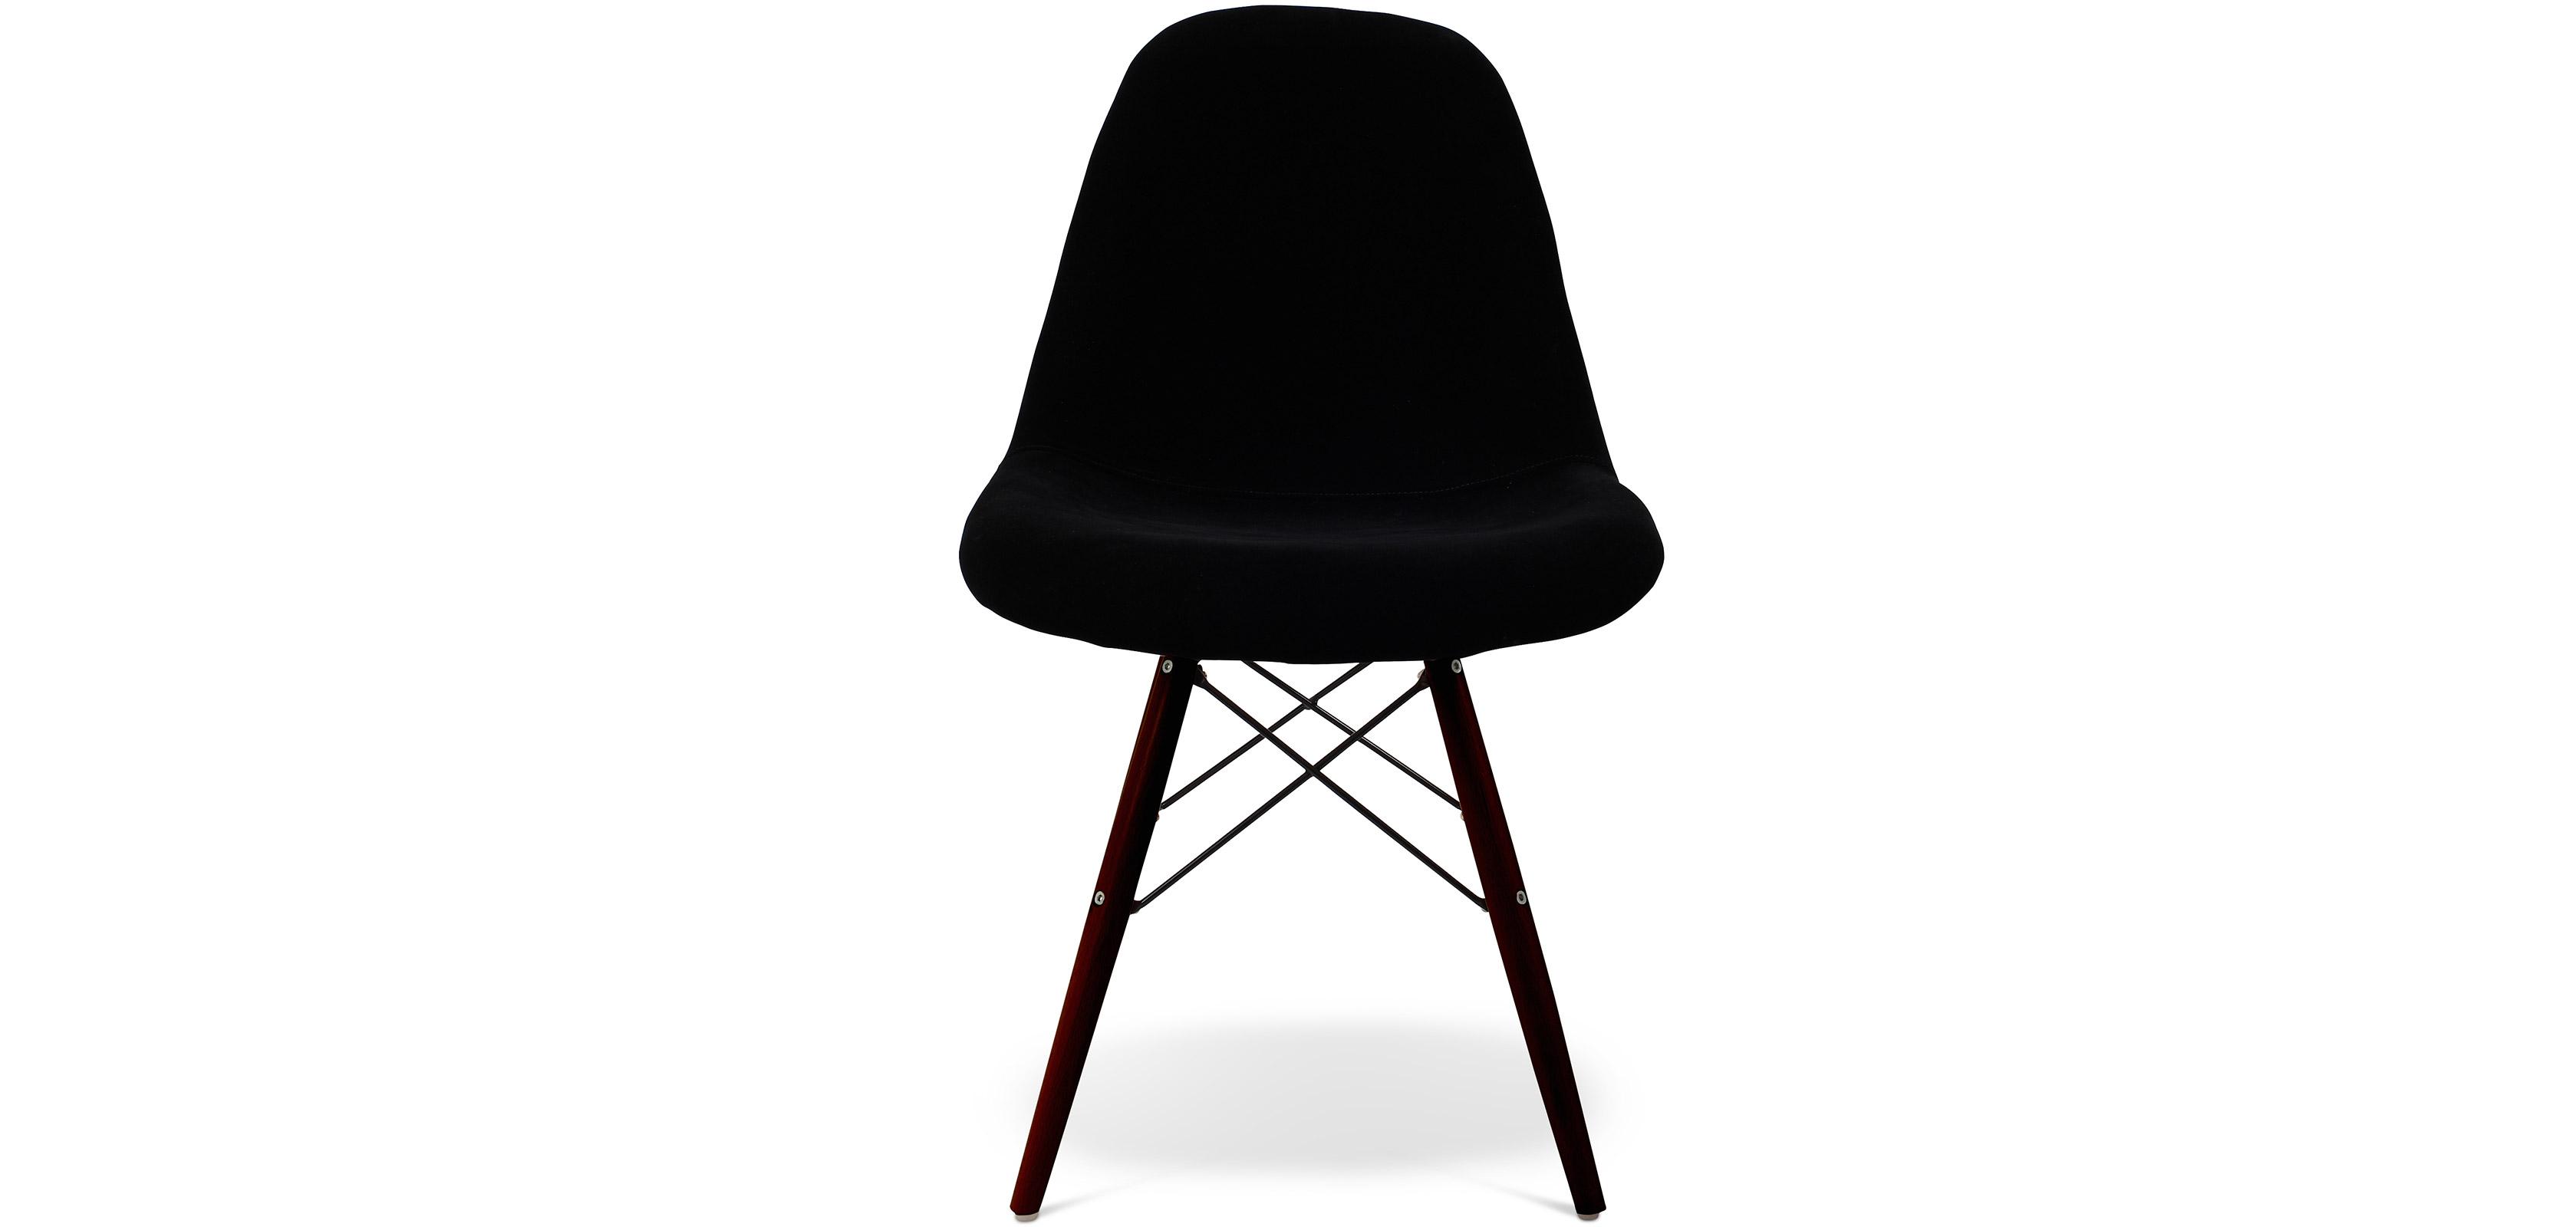 Tomatenreste Im Stuhl